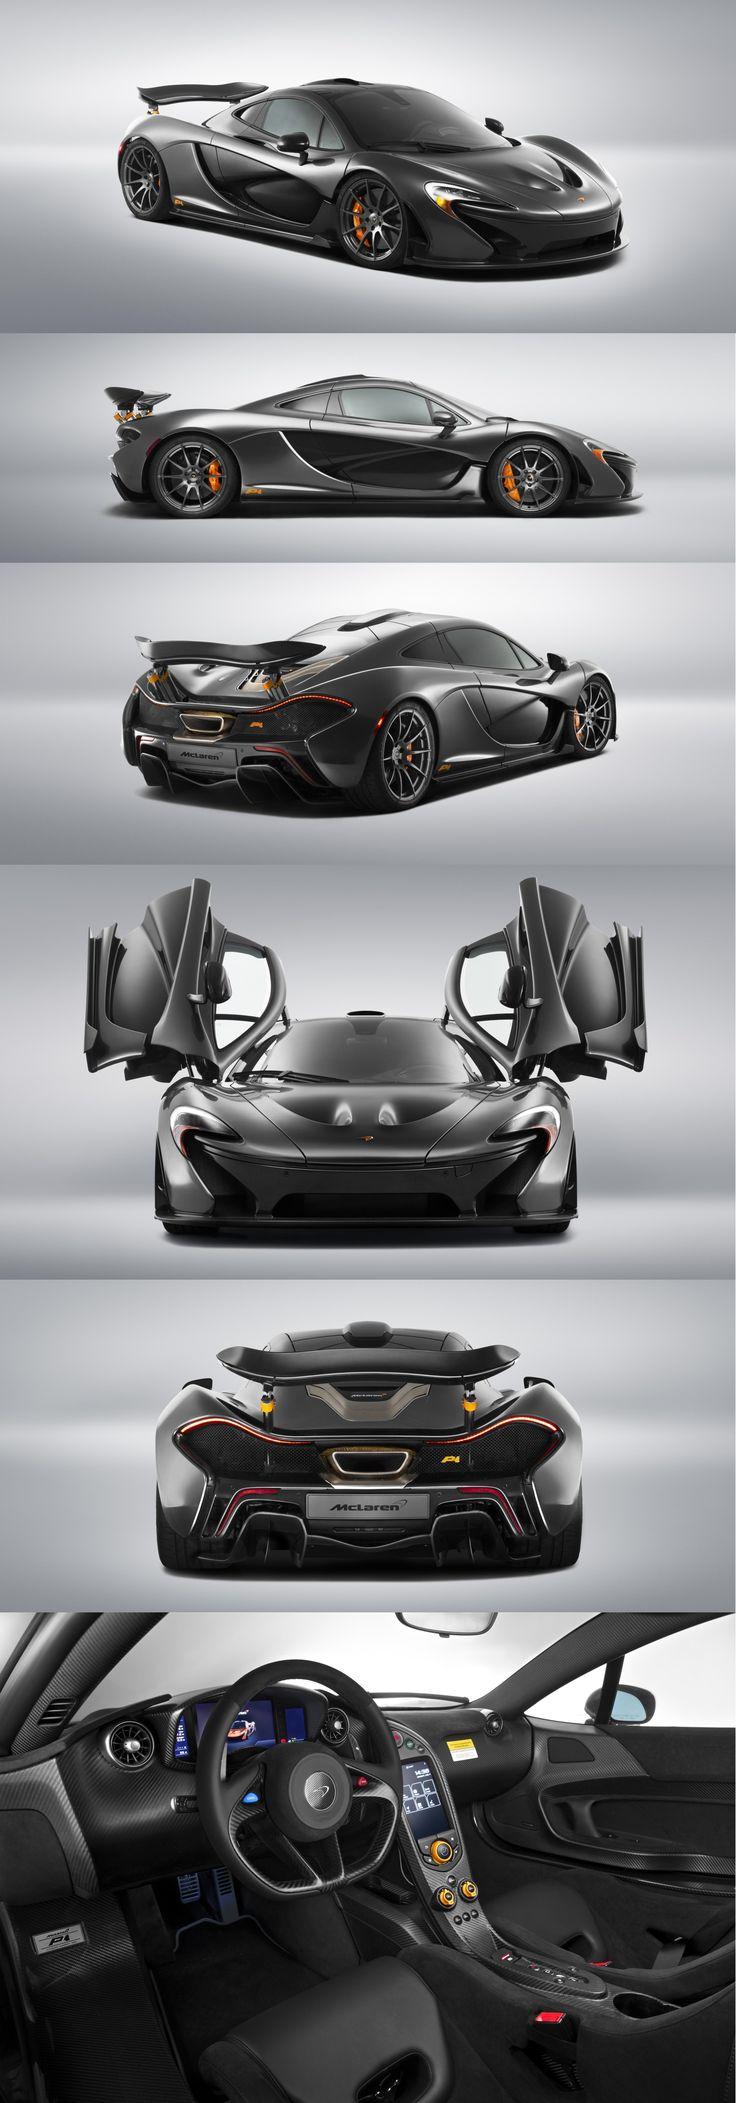 McLaren P1 in Stealth Grey and Orange